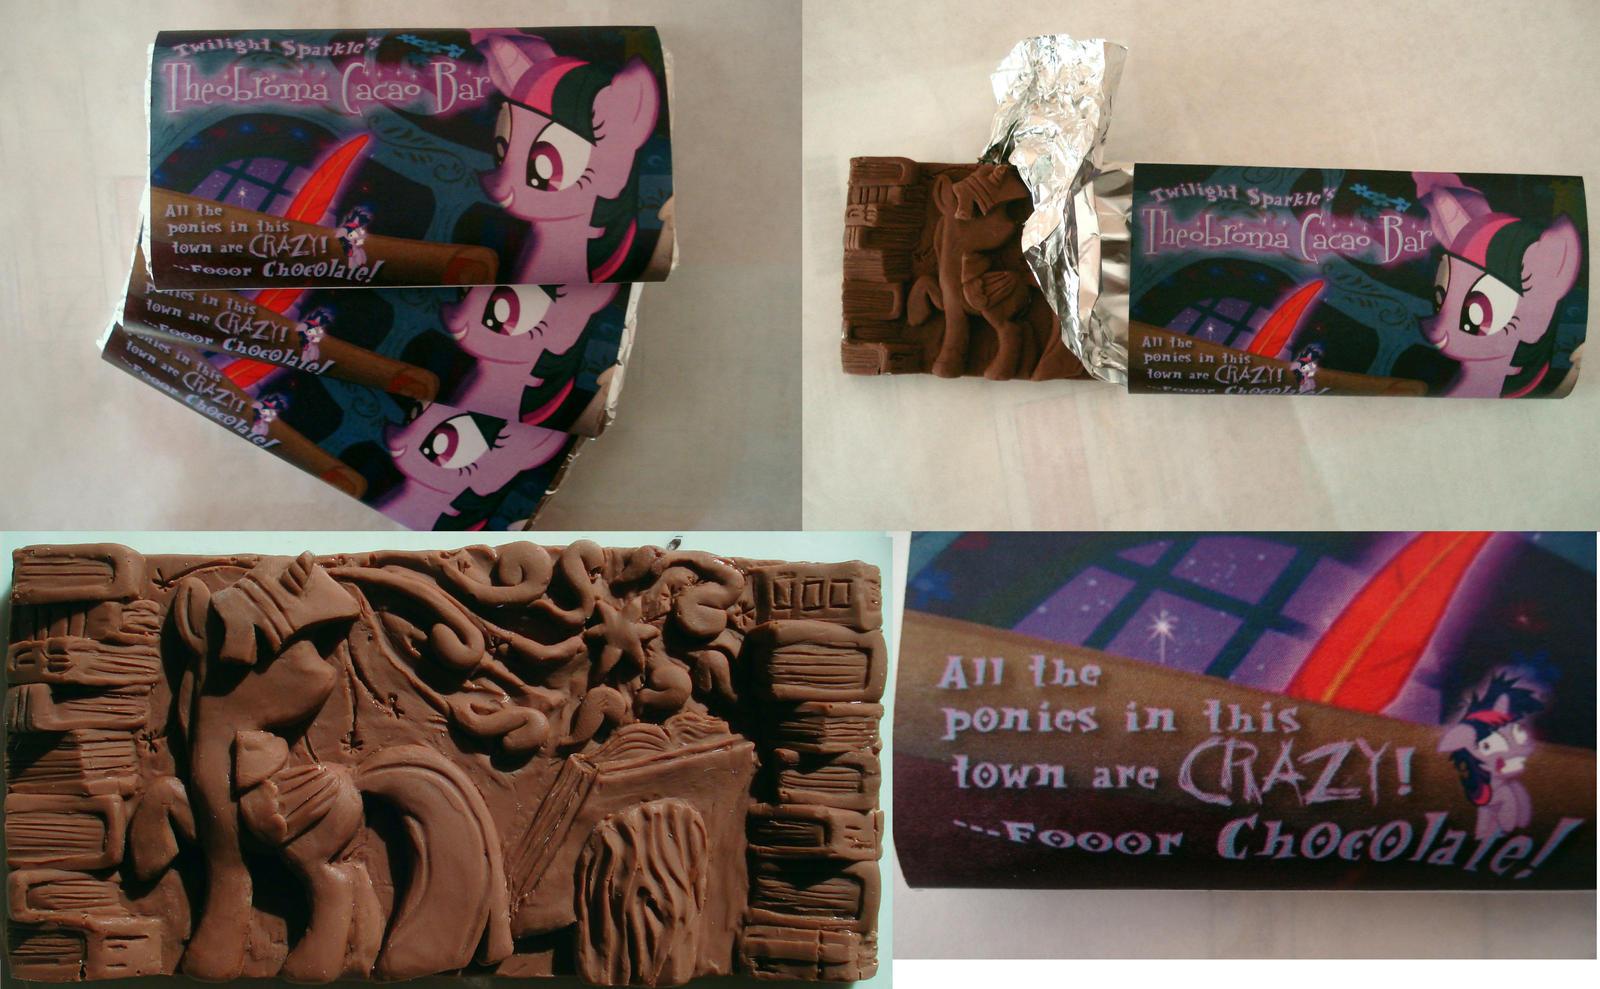 [Image: twilight_sparkle_s_theobroma_cacao_bar__...8c1r13.jpg]